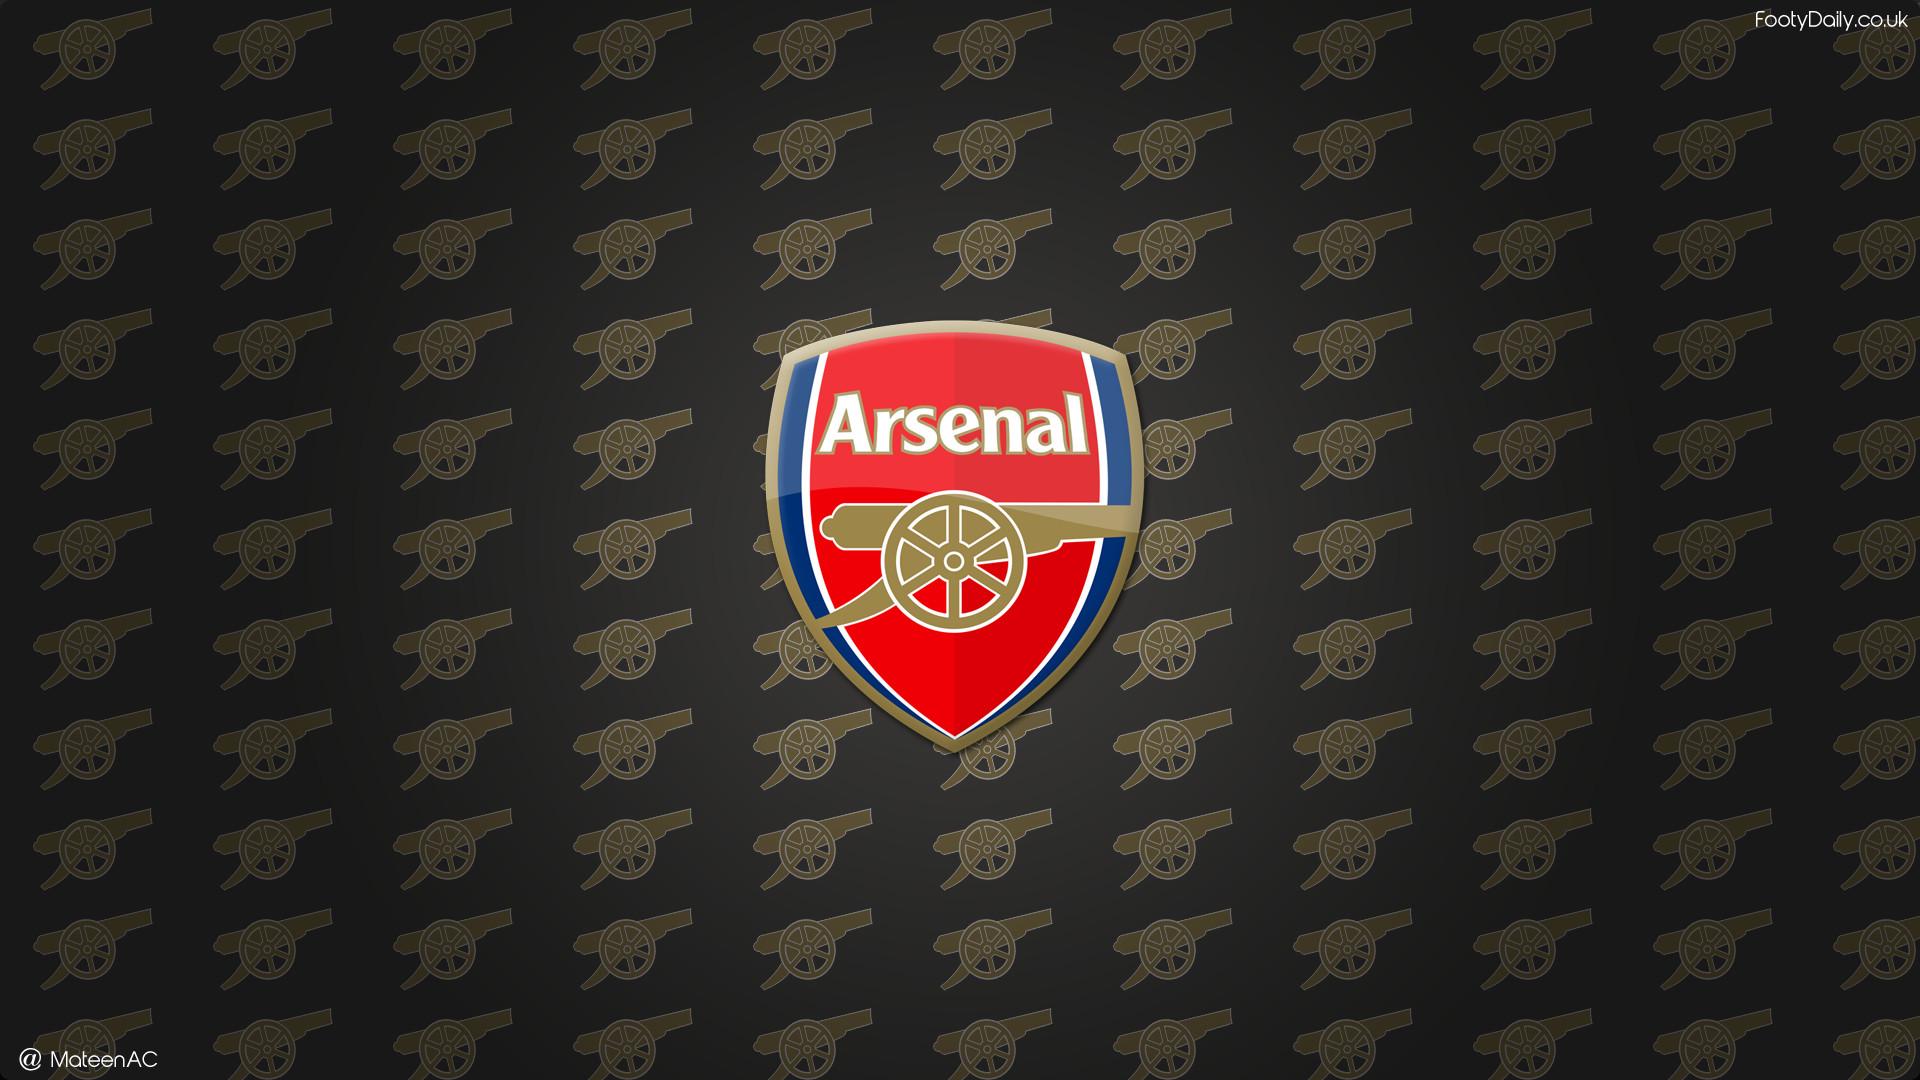 0 Hd Arsenal Wallpapers Hd Arsenal Wallpapers